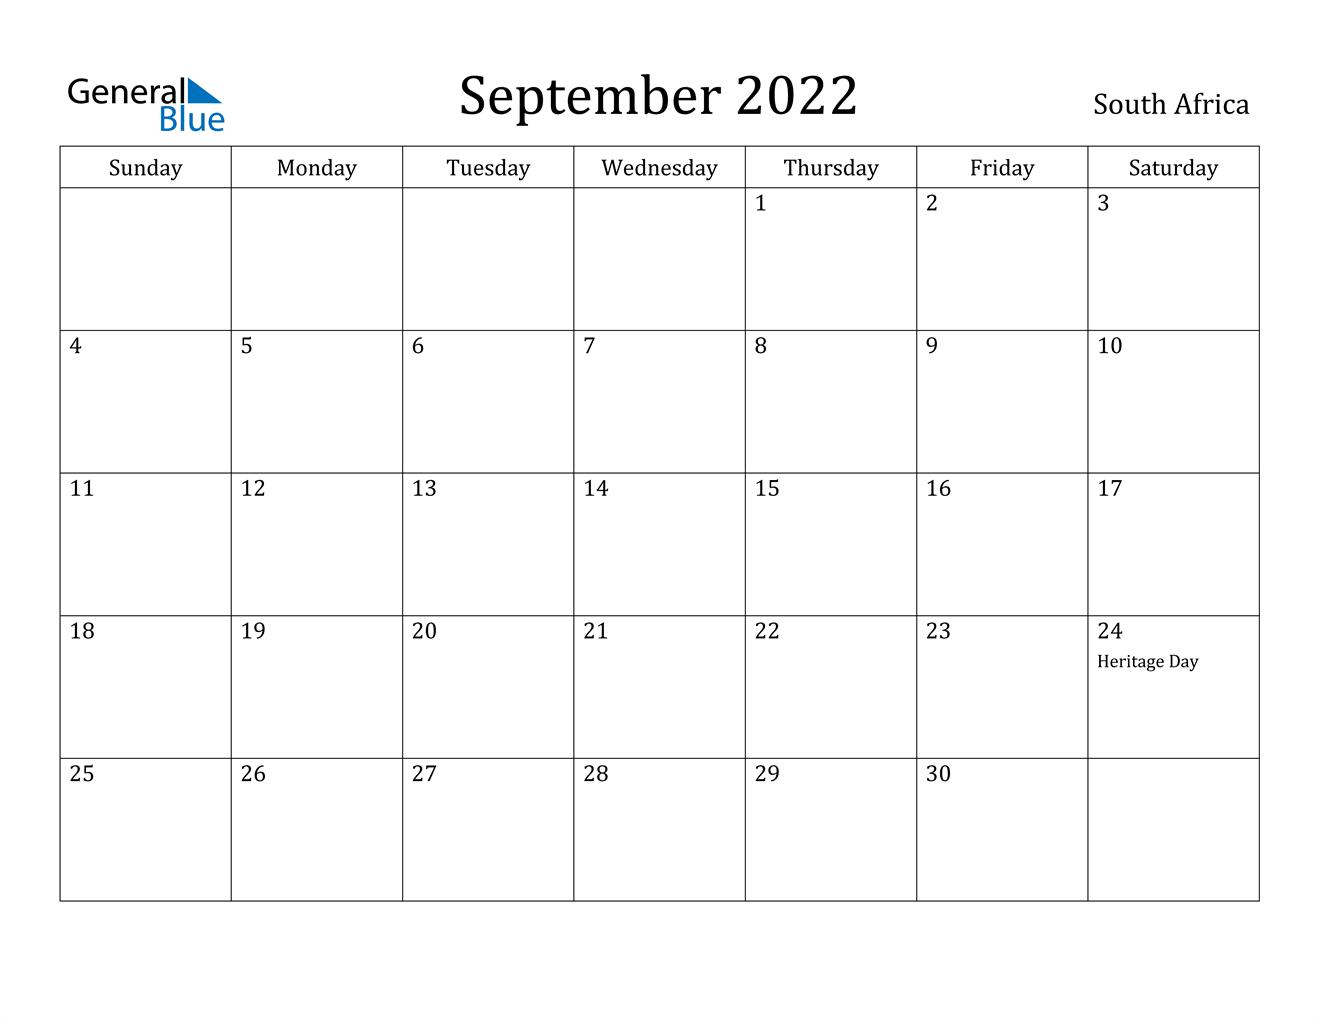 September 2022 Calendar - South Africa